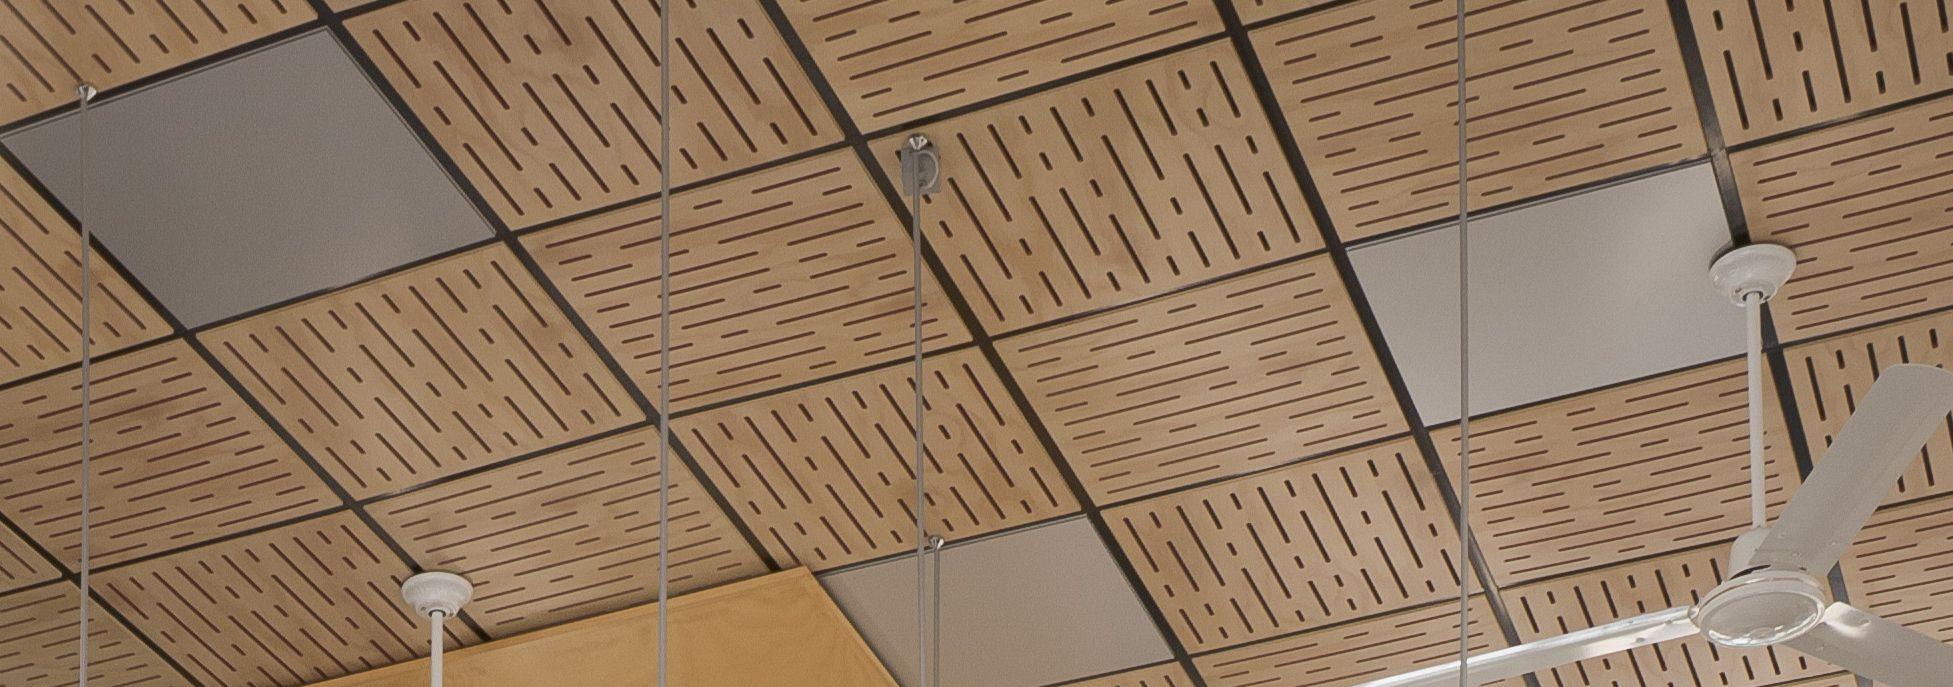 Modern Drop Ceiling Tiles Google Search Drop Ceiling Tiles Ceiling Tiles Dropped Ceiling